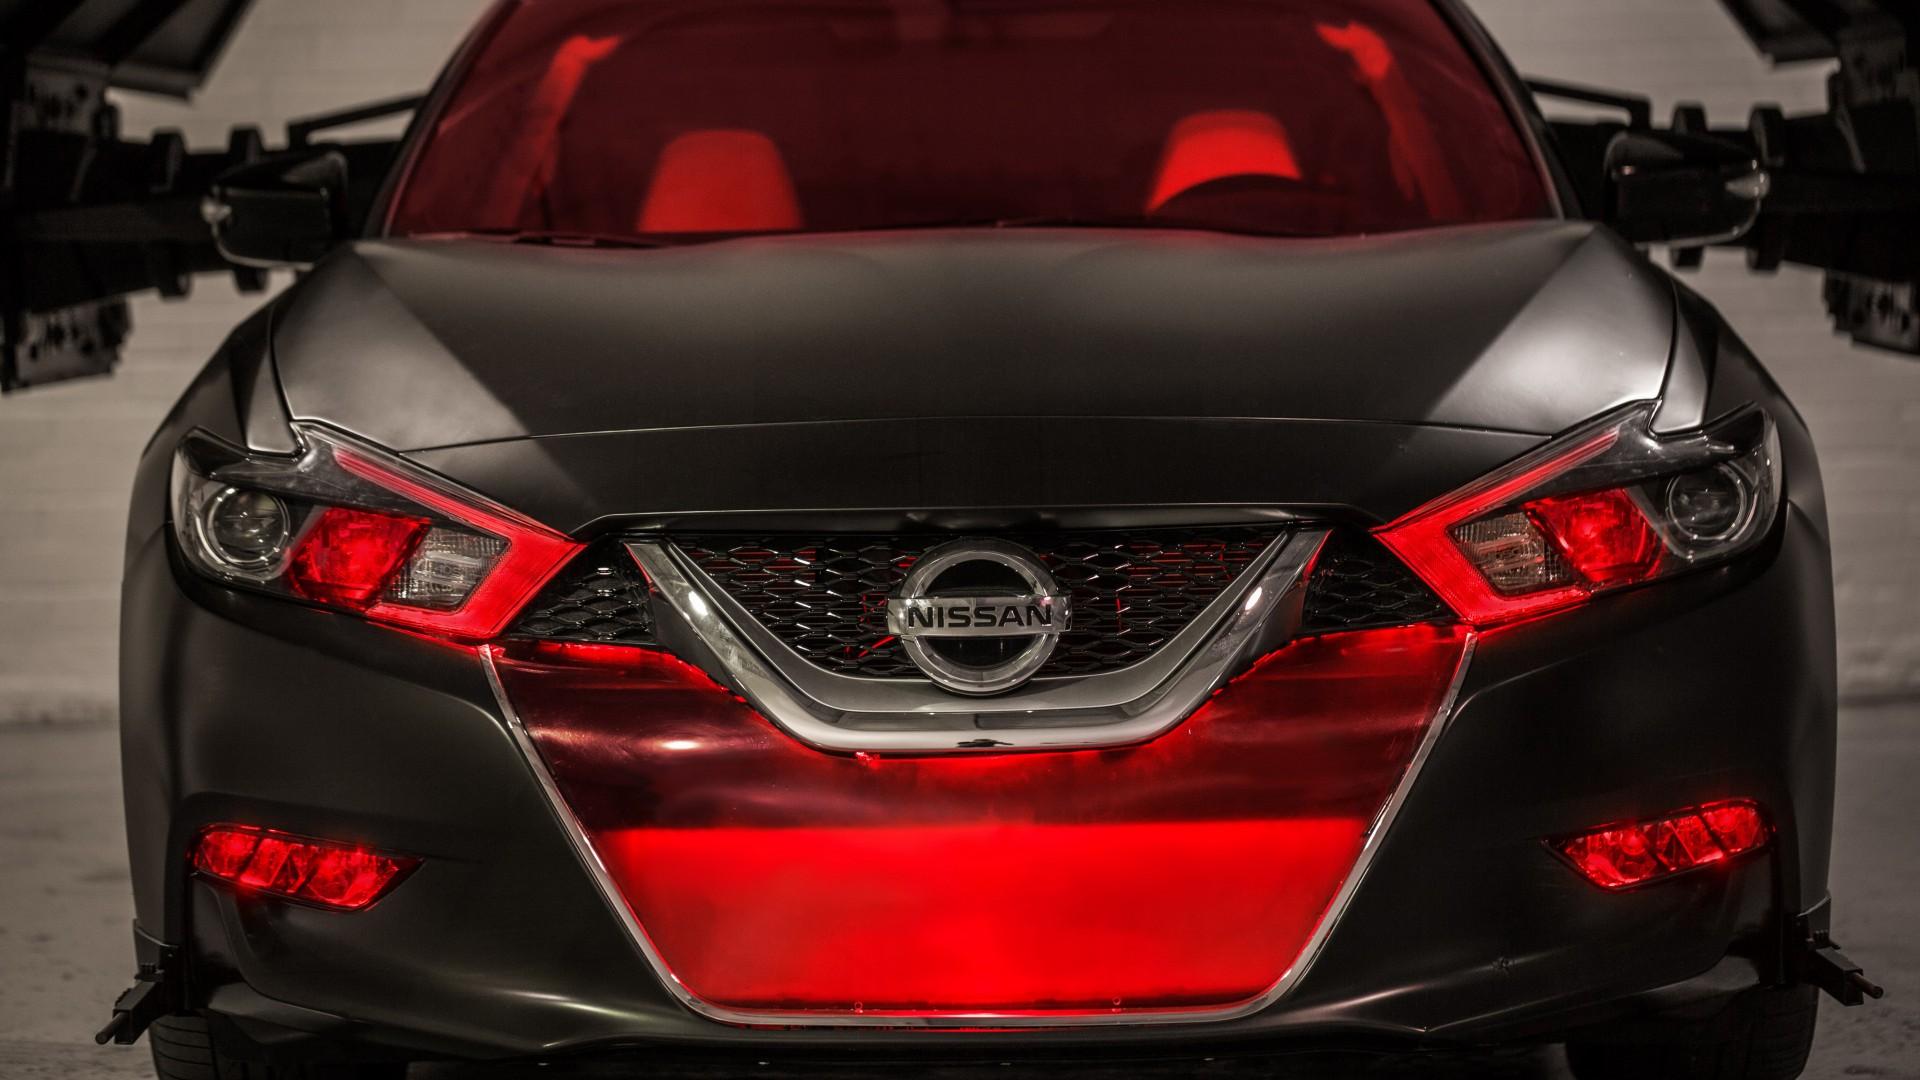 Nissan Maxima Kylo Ren TIE Silencer 4K Wallpaper   HD Car ...